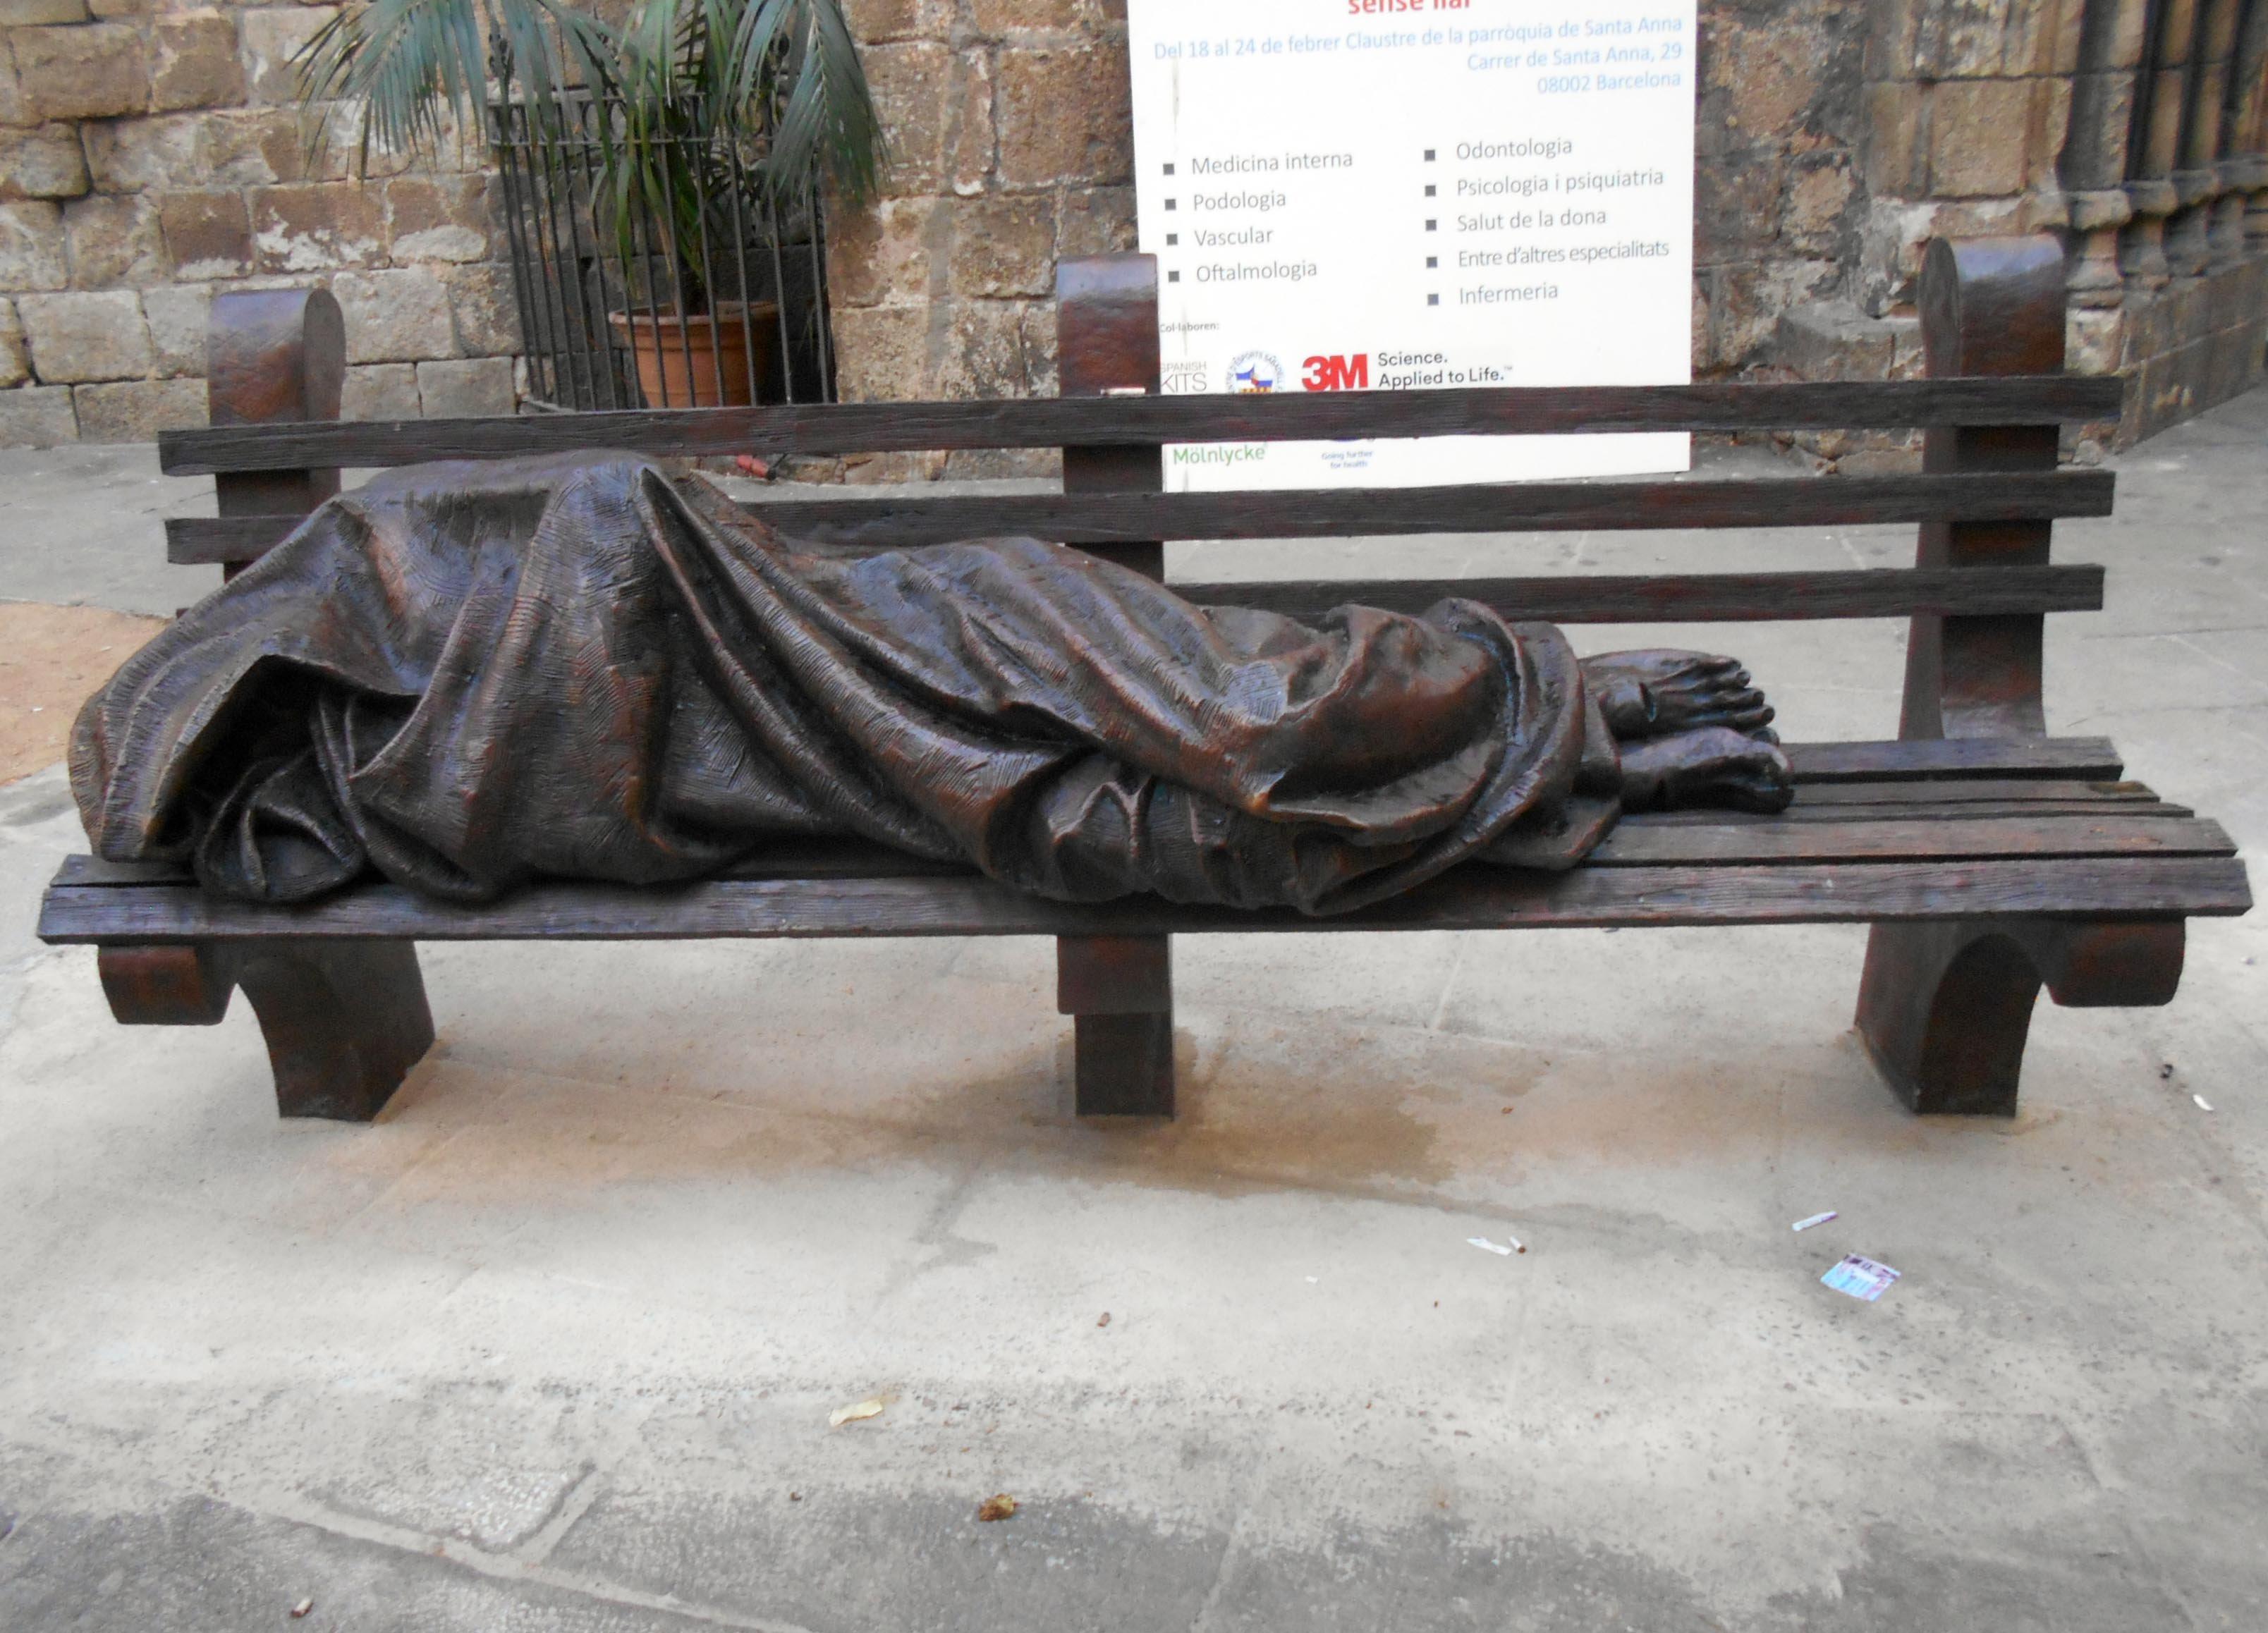 Jesus_Homeless_BCN_1